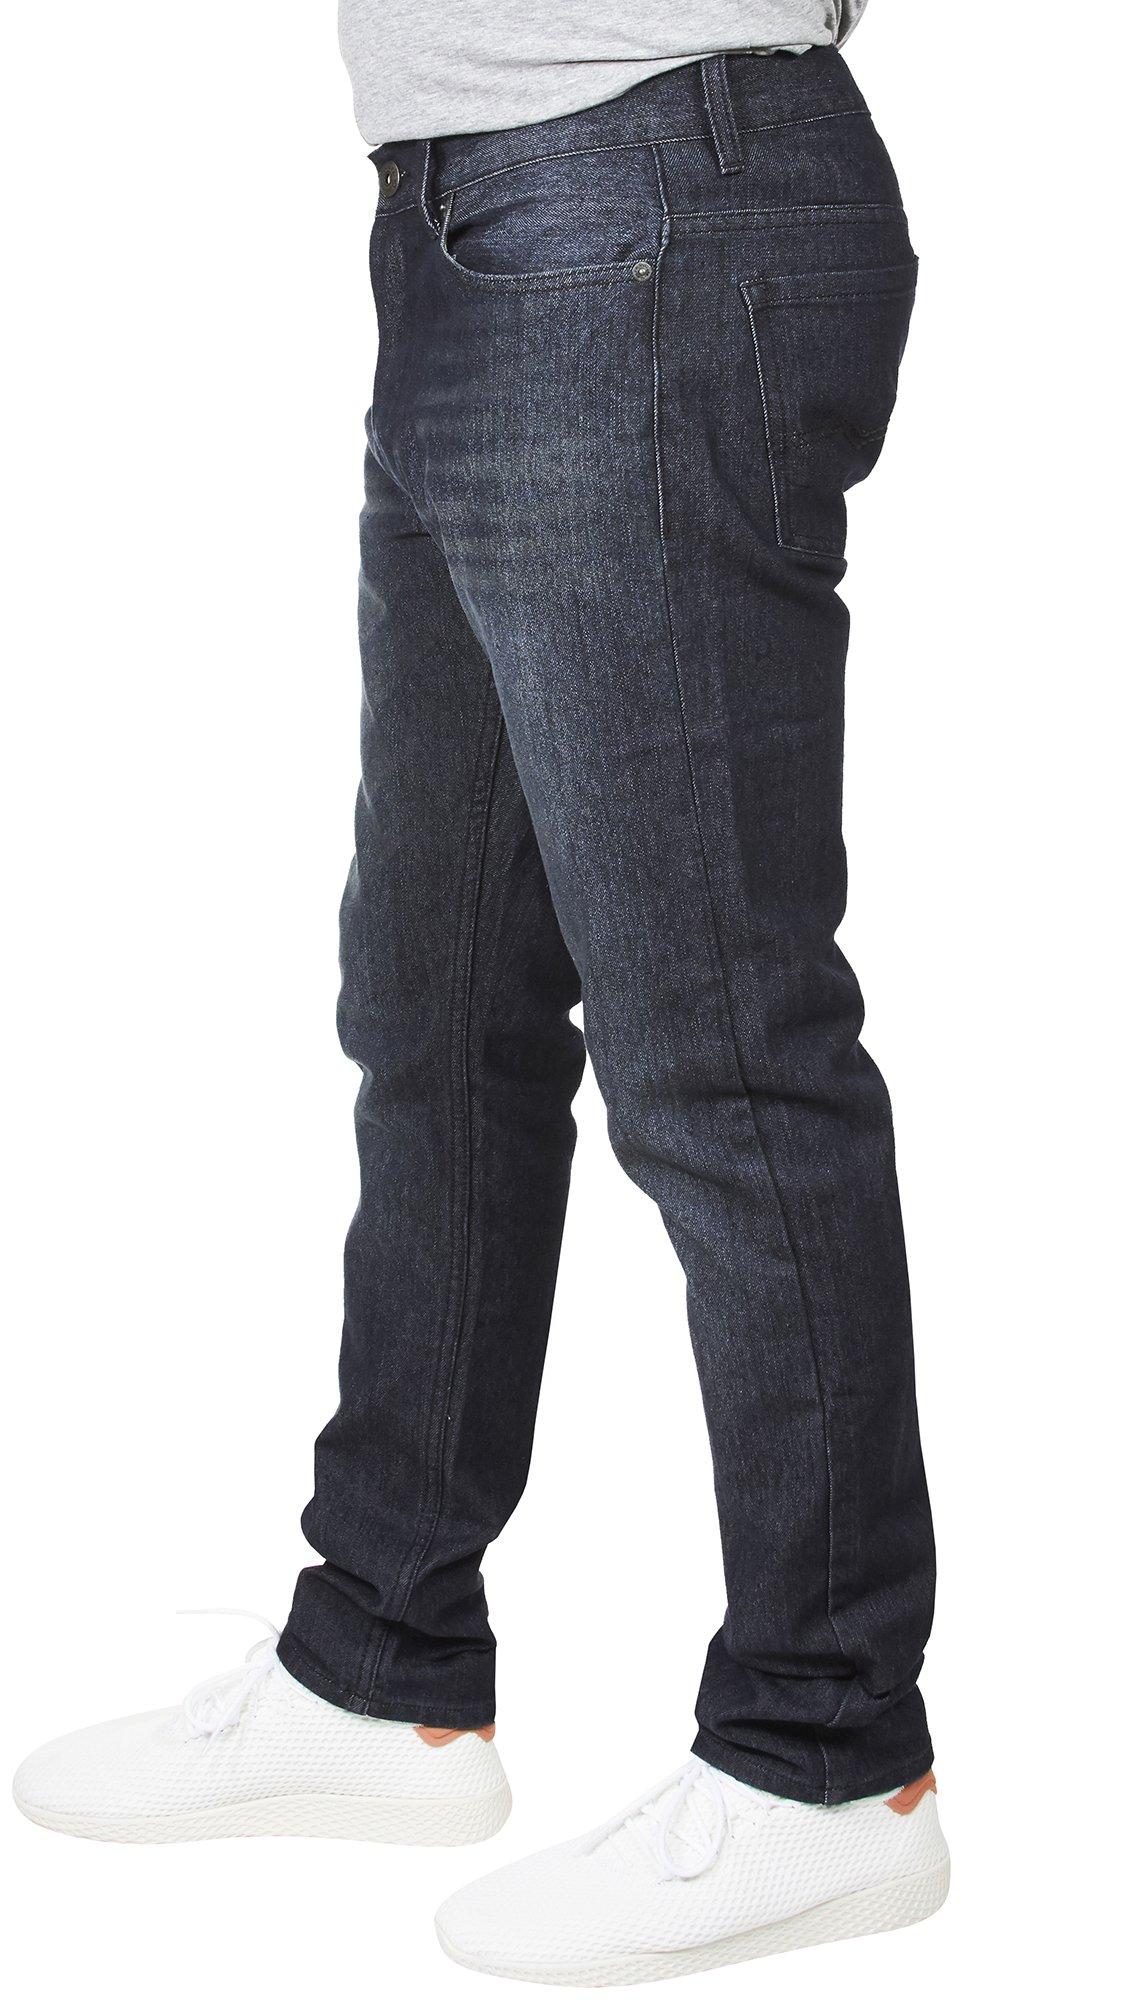 VINTAGE GENES 1891 Mens Stretch Skinny Washed Denim Jeans, Dark Enzyme Blue 34x32 by VINTAGE GENES (Image #2)